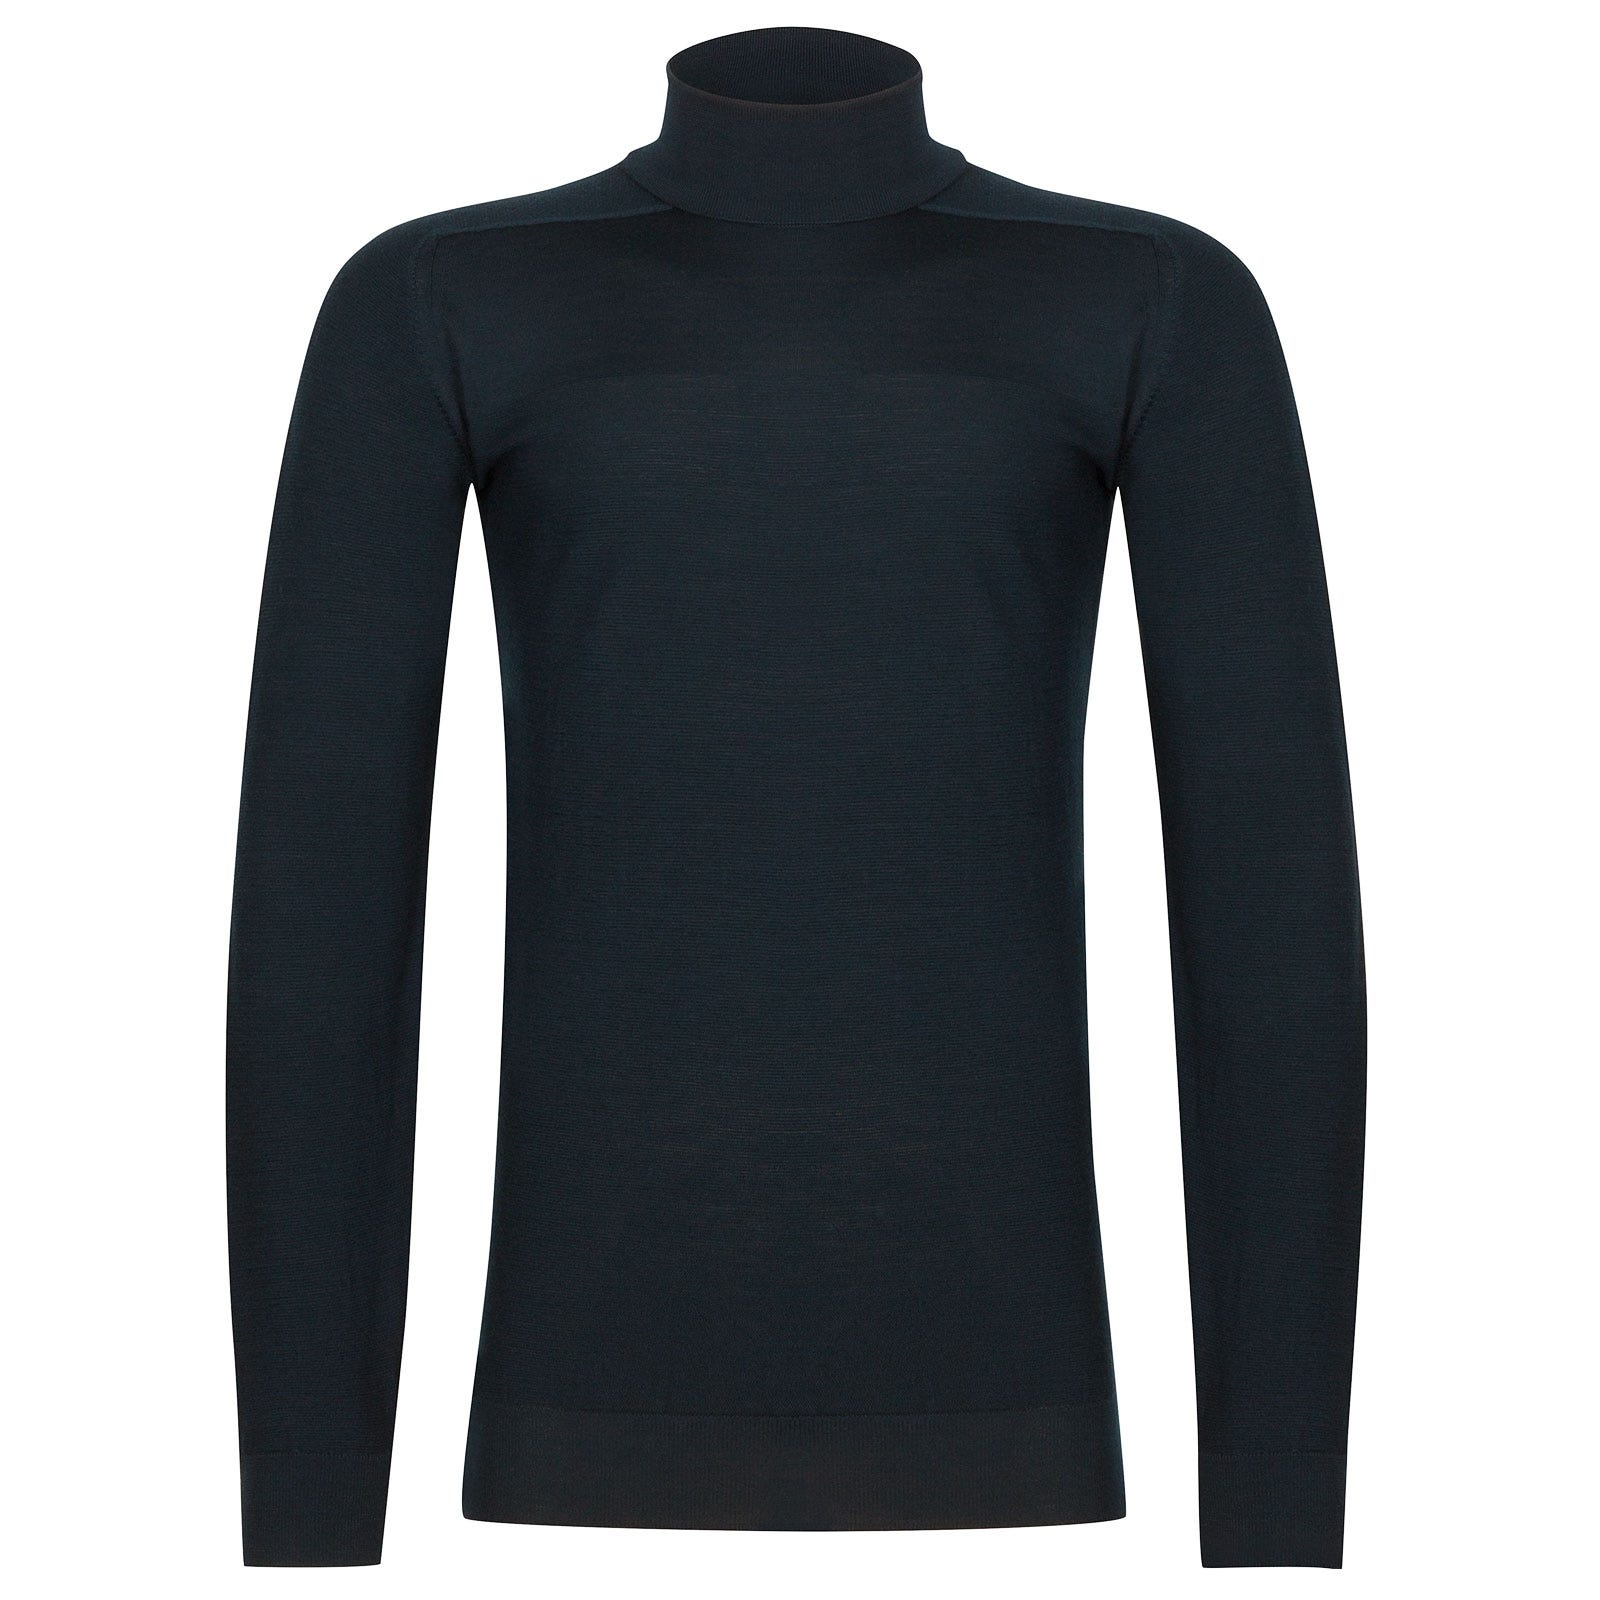 John Smedley Paxon Extra Fine Merino Pullover in Orion Green-XL